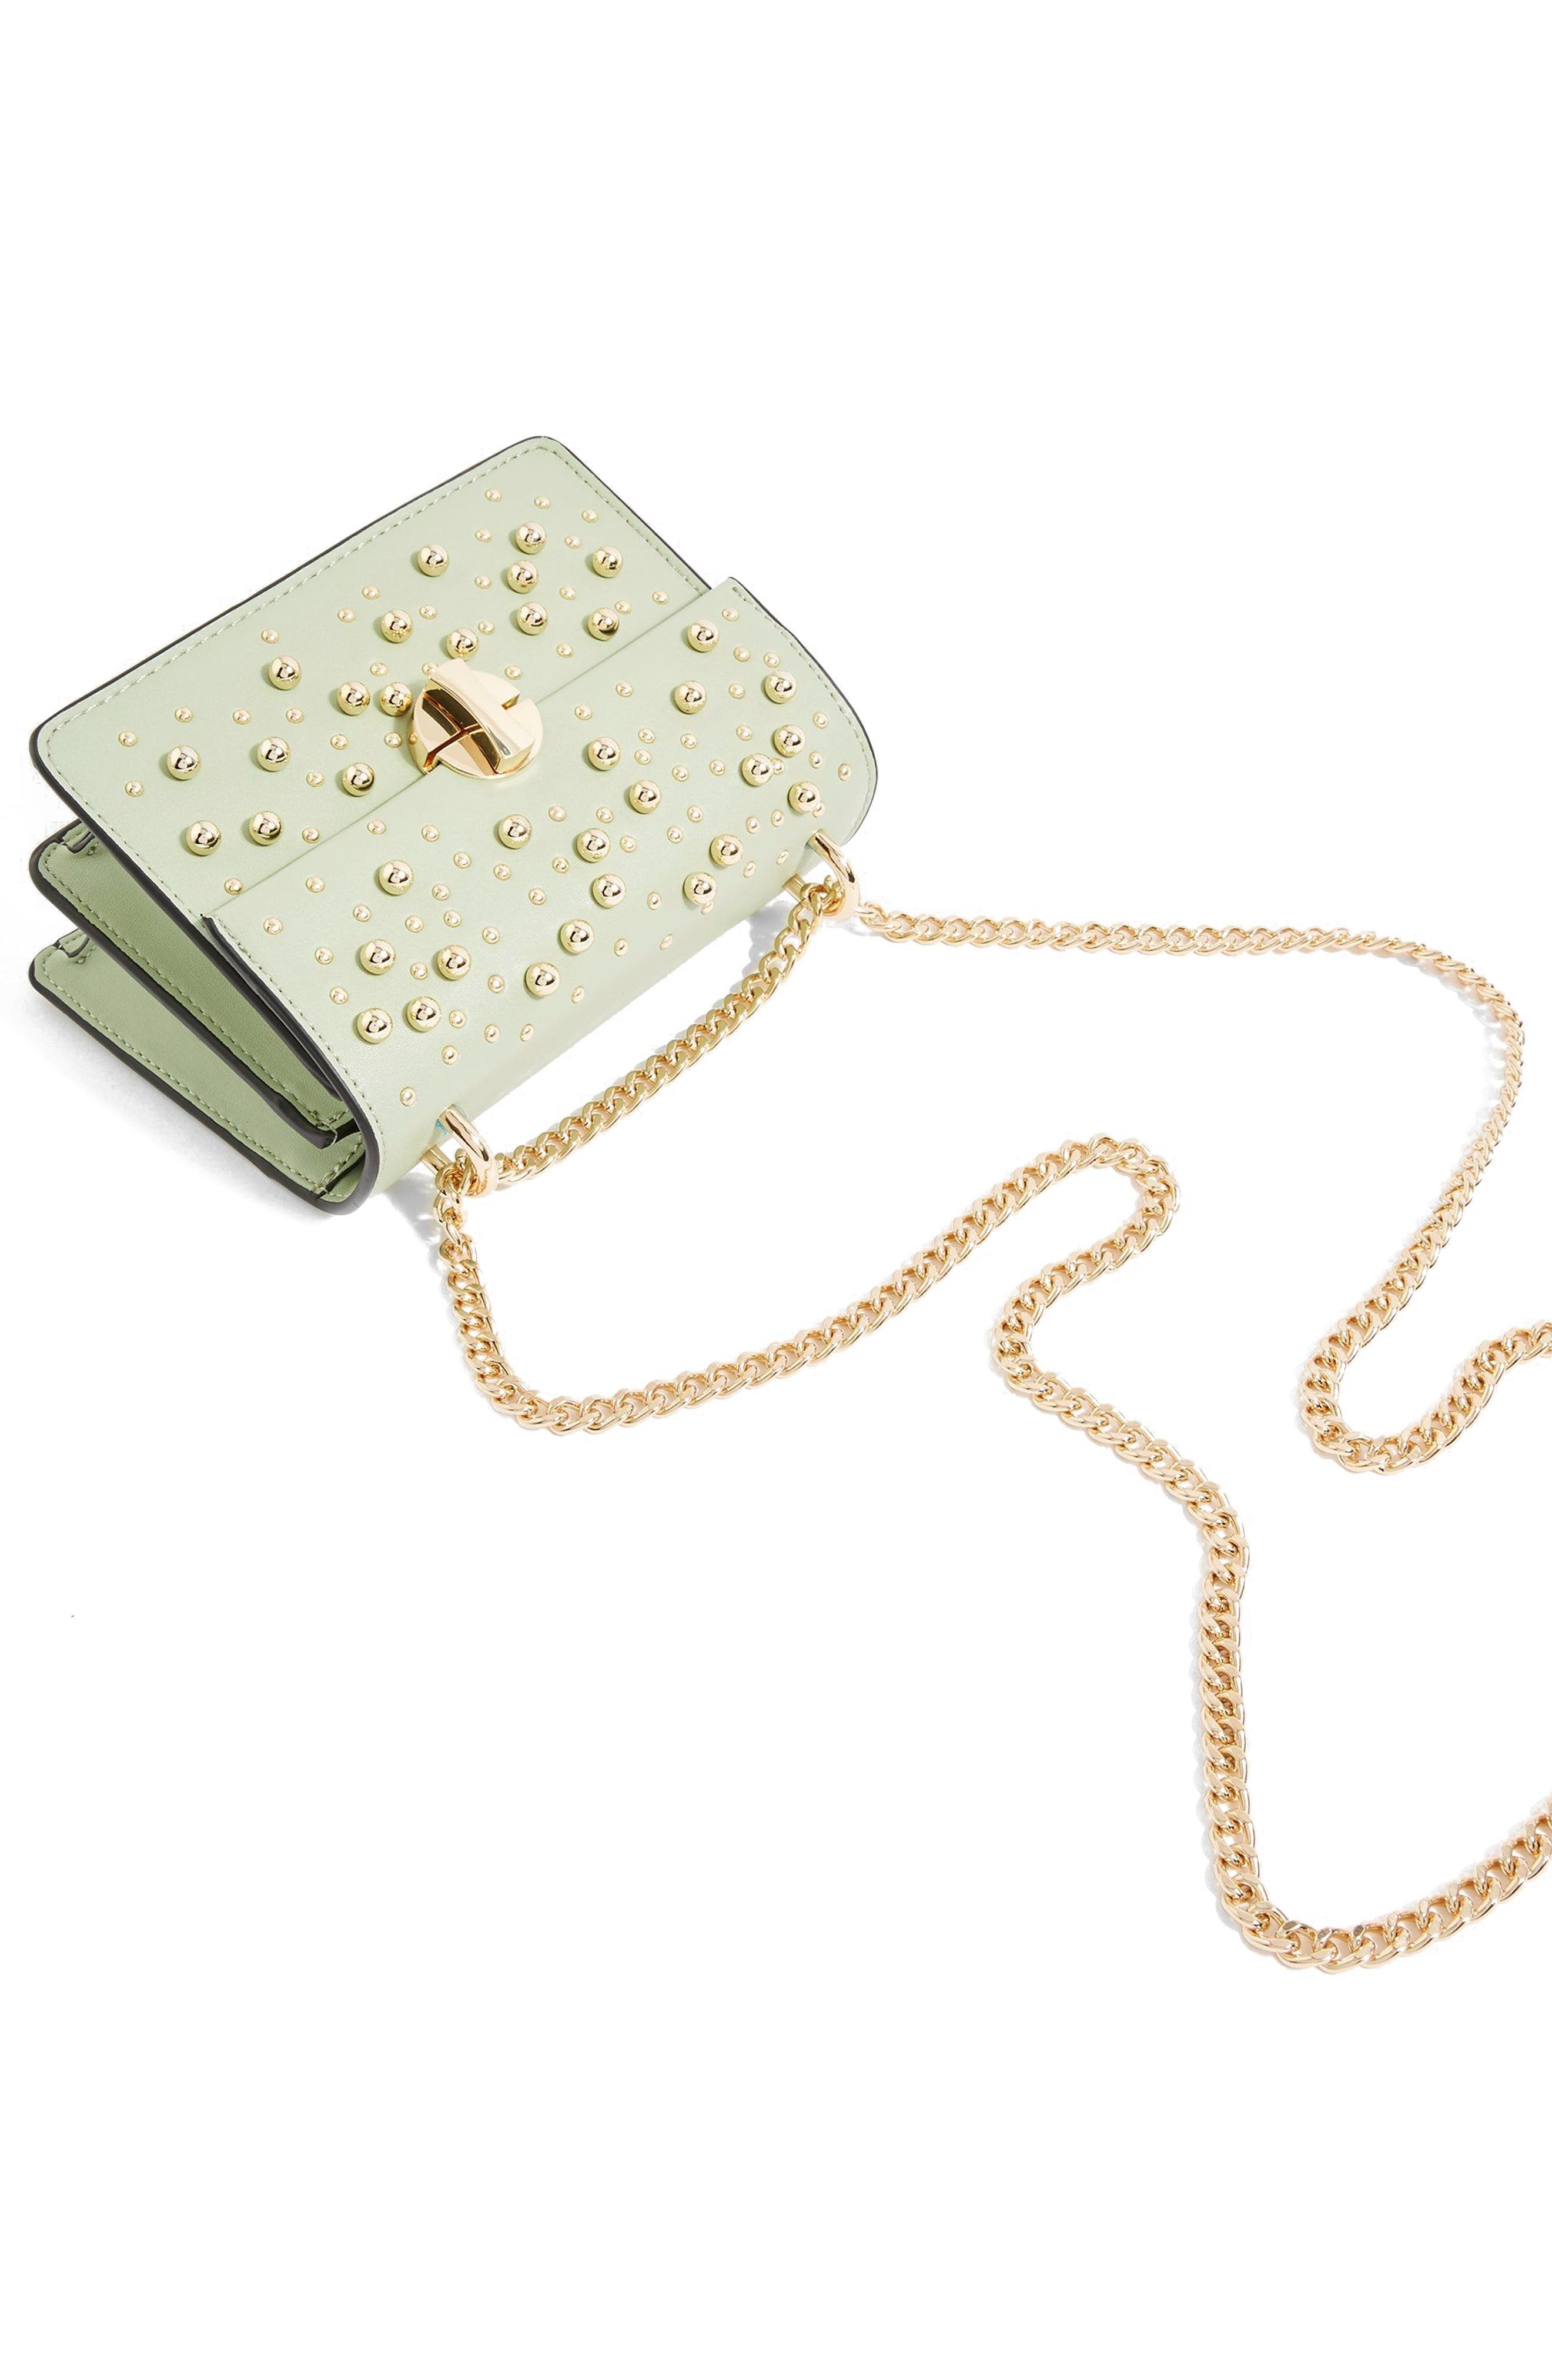 Betty Ball Crossbody Bag,                             Alternate thumbnail 3, color,                             300